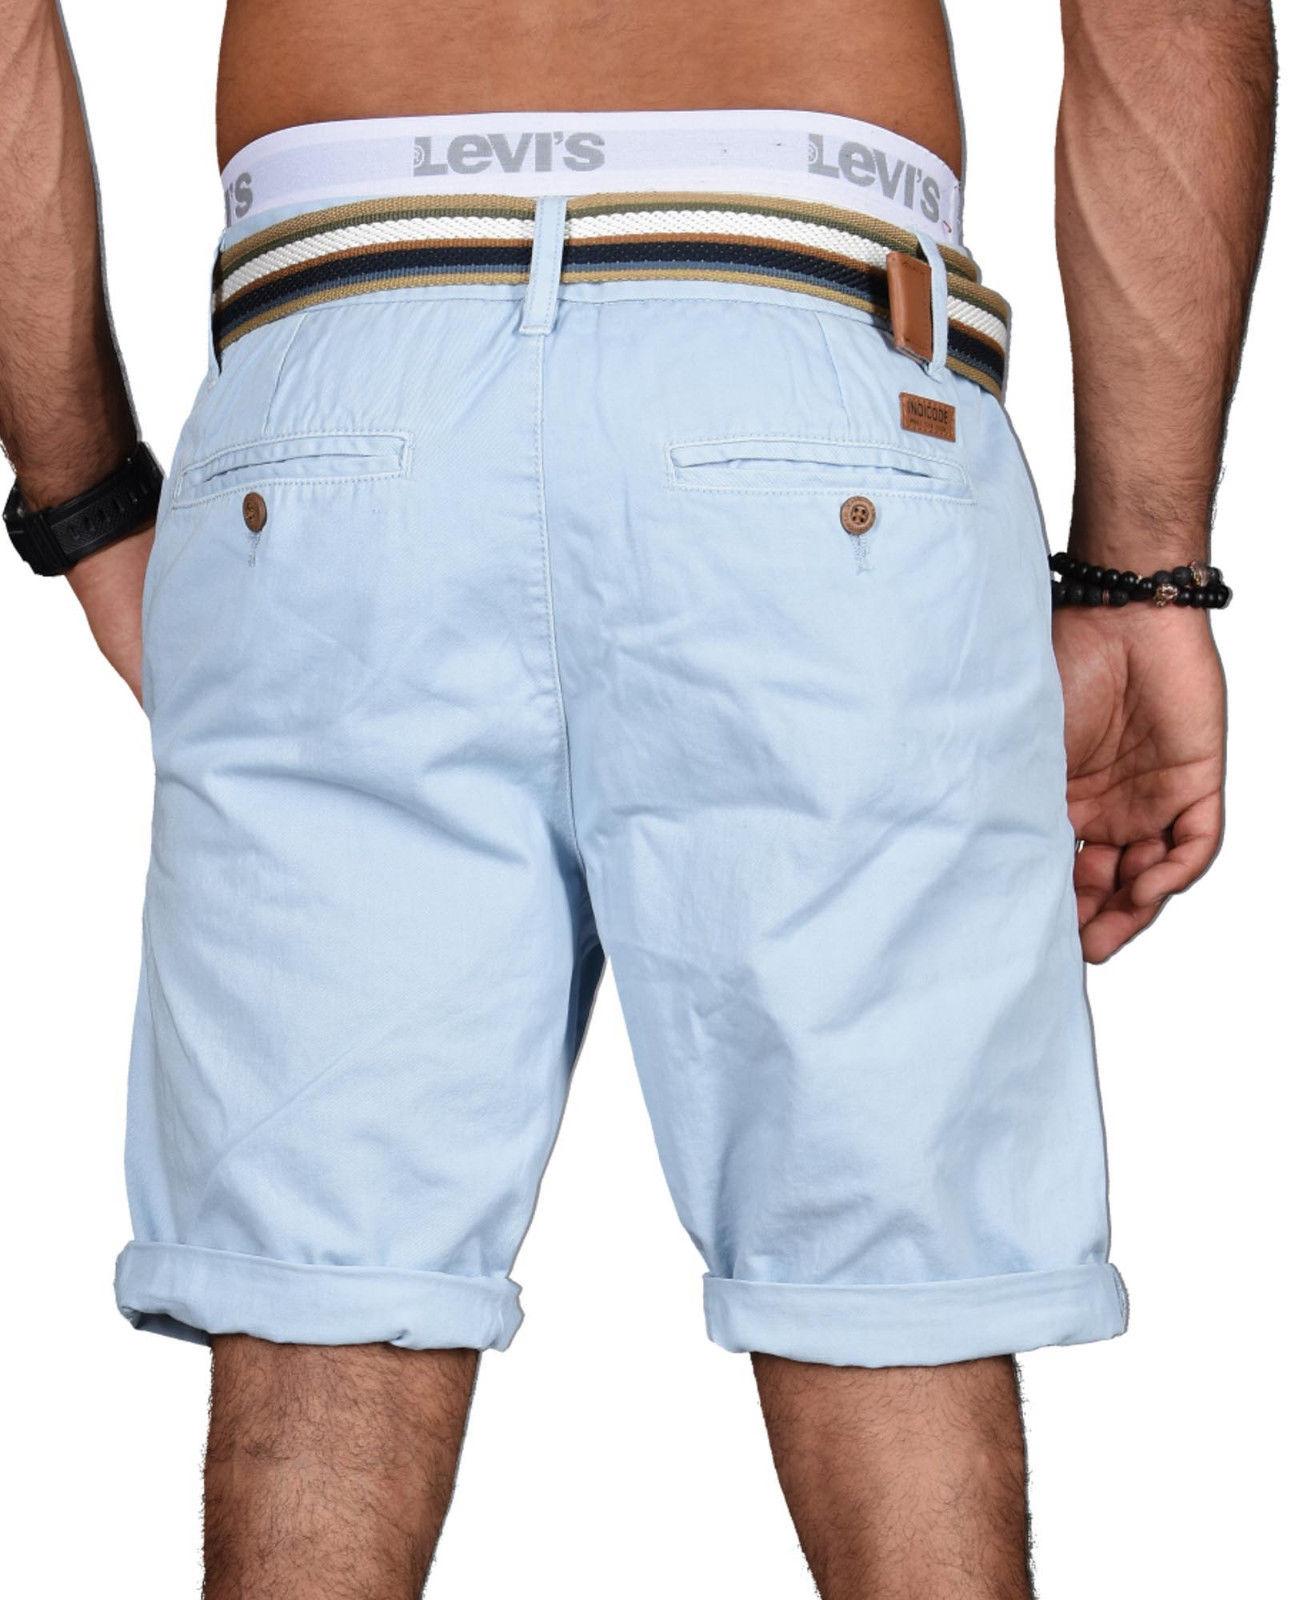 Indicode-Herren-Sommer-Bermuda-Chino-Shorts-kurze-Hose-Sommerhose-Short-NEU-B499 Indexbild 13